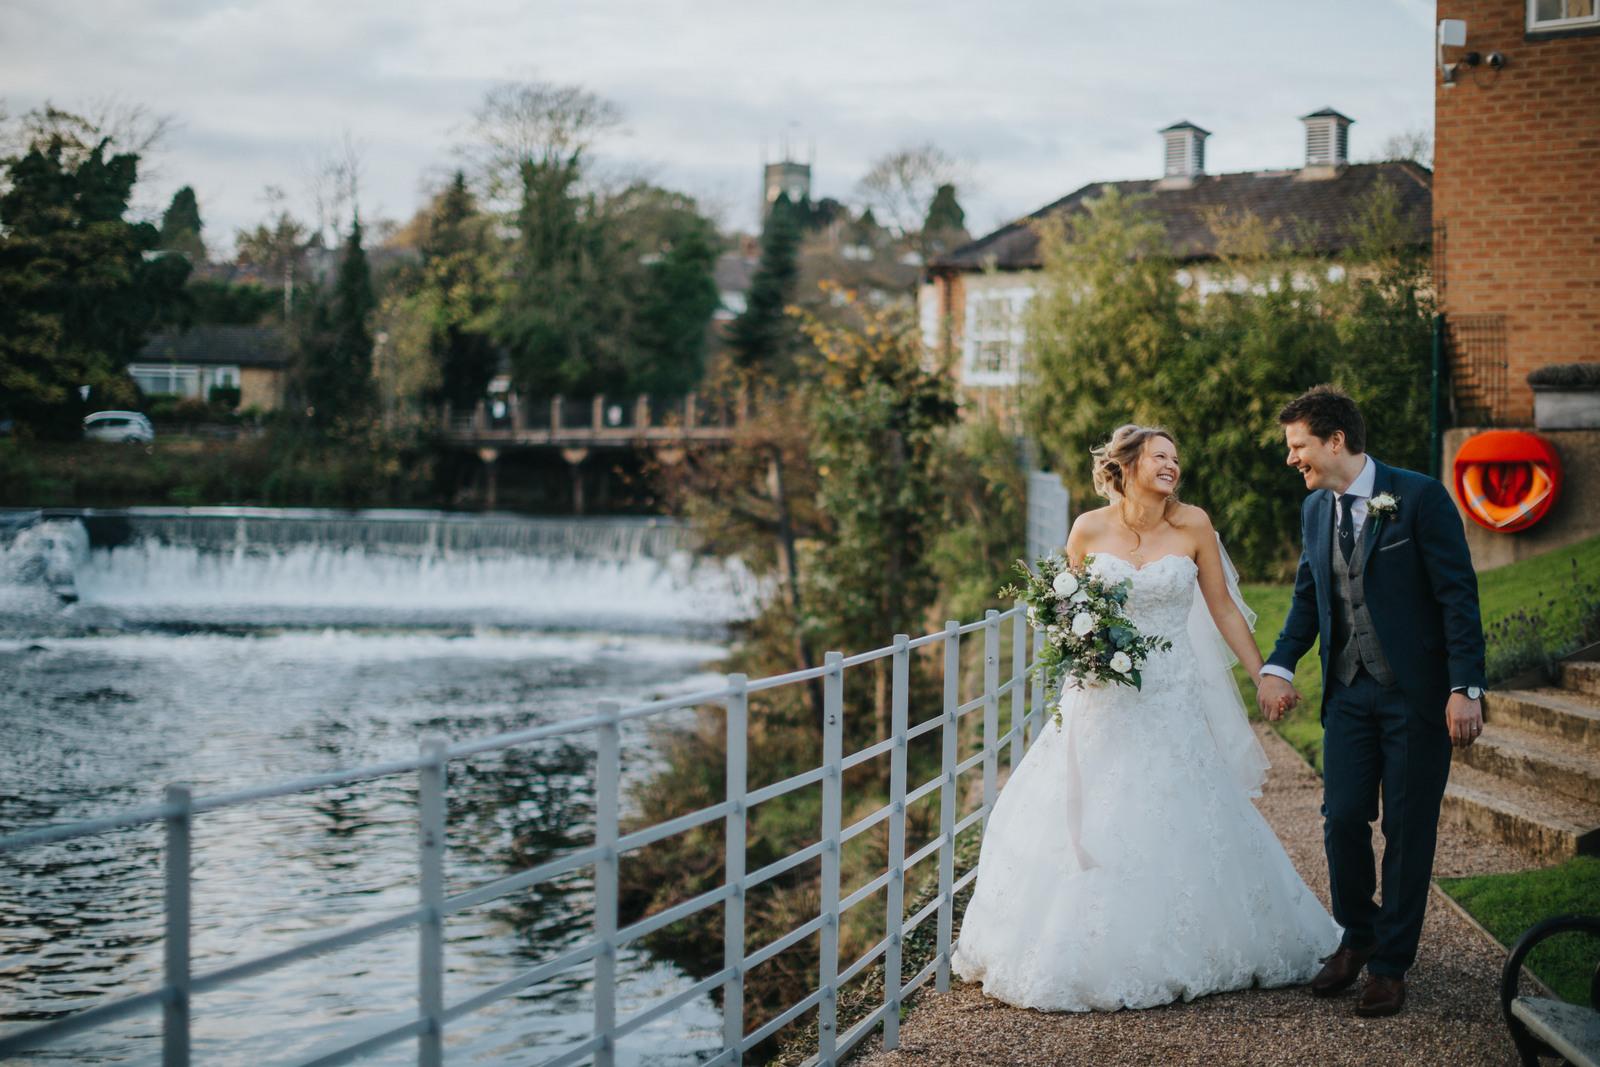 52-Chloe & Tom Wedding-698.jpg